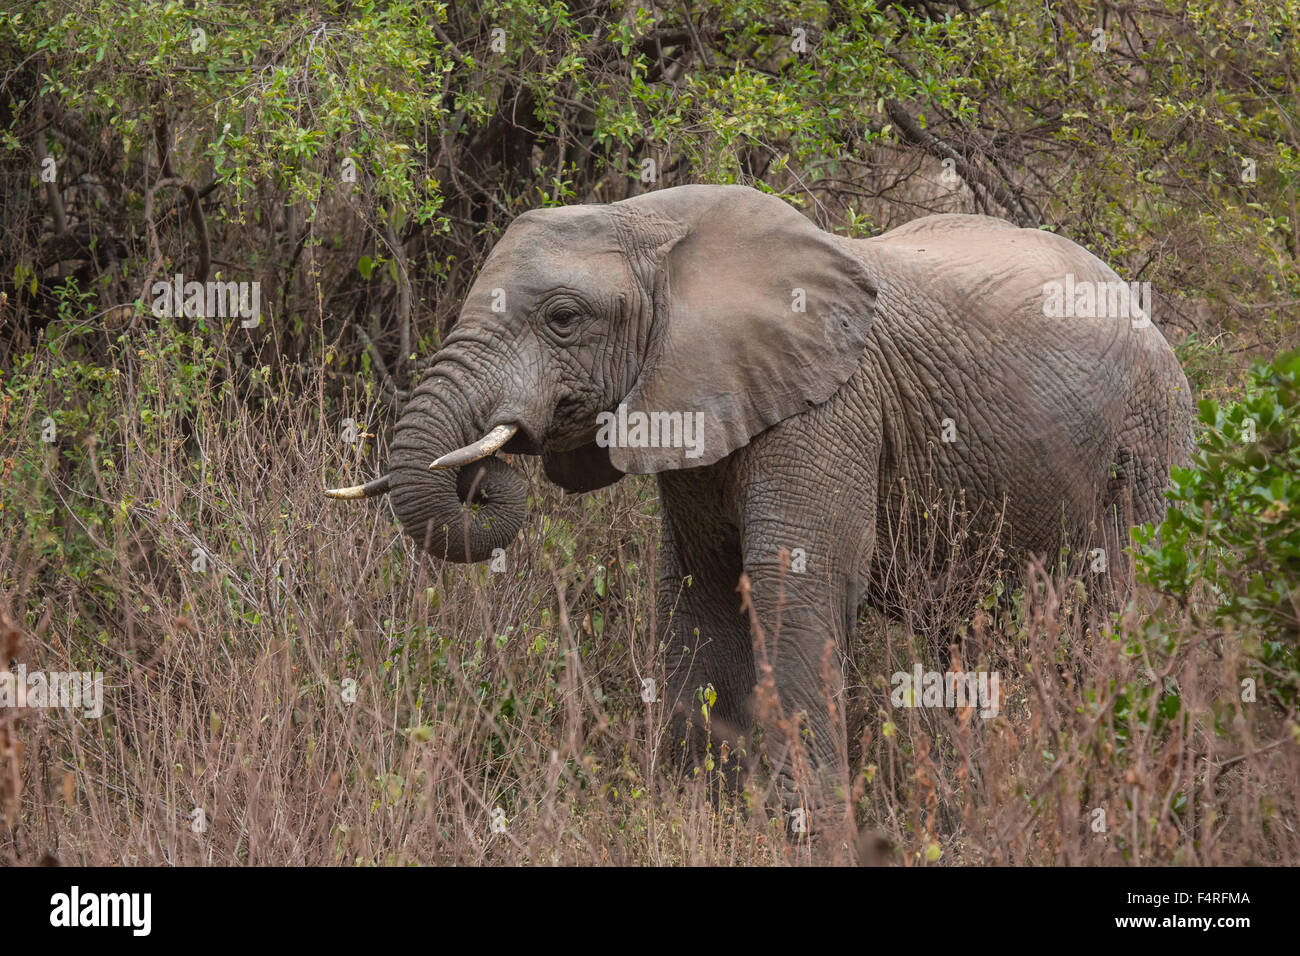 Africa, elephant, Lake Manyara, national park, safari, travel, mammals, Tanzania, animals, wilderness, wild animals - Stock Image